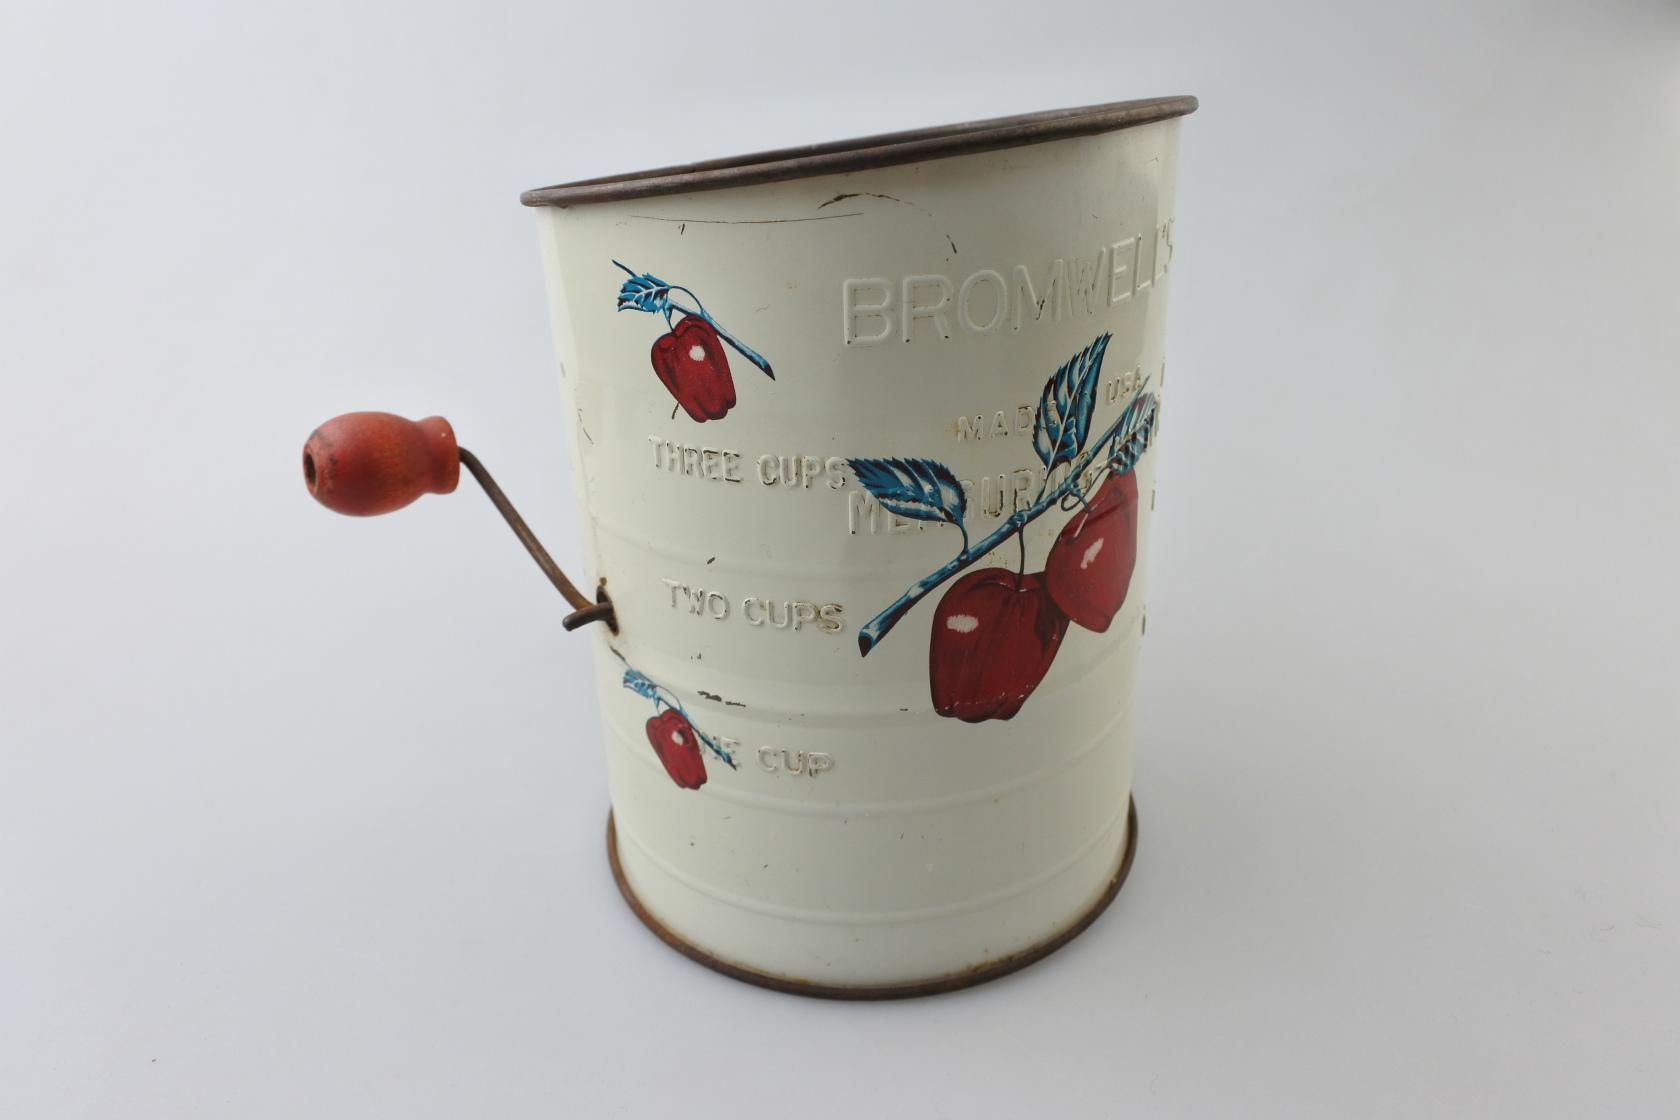 vi-bromwells-apple